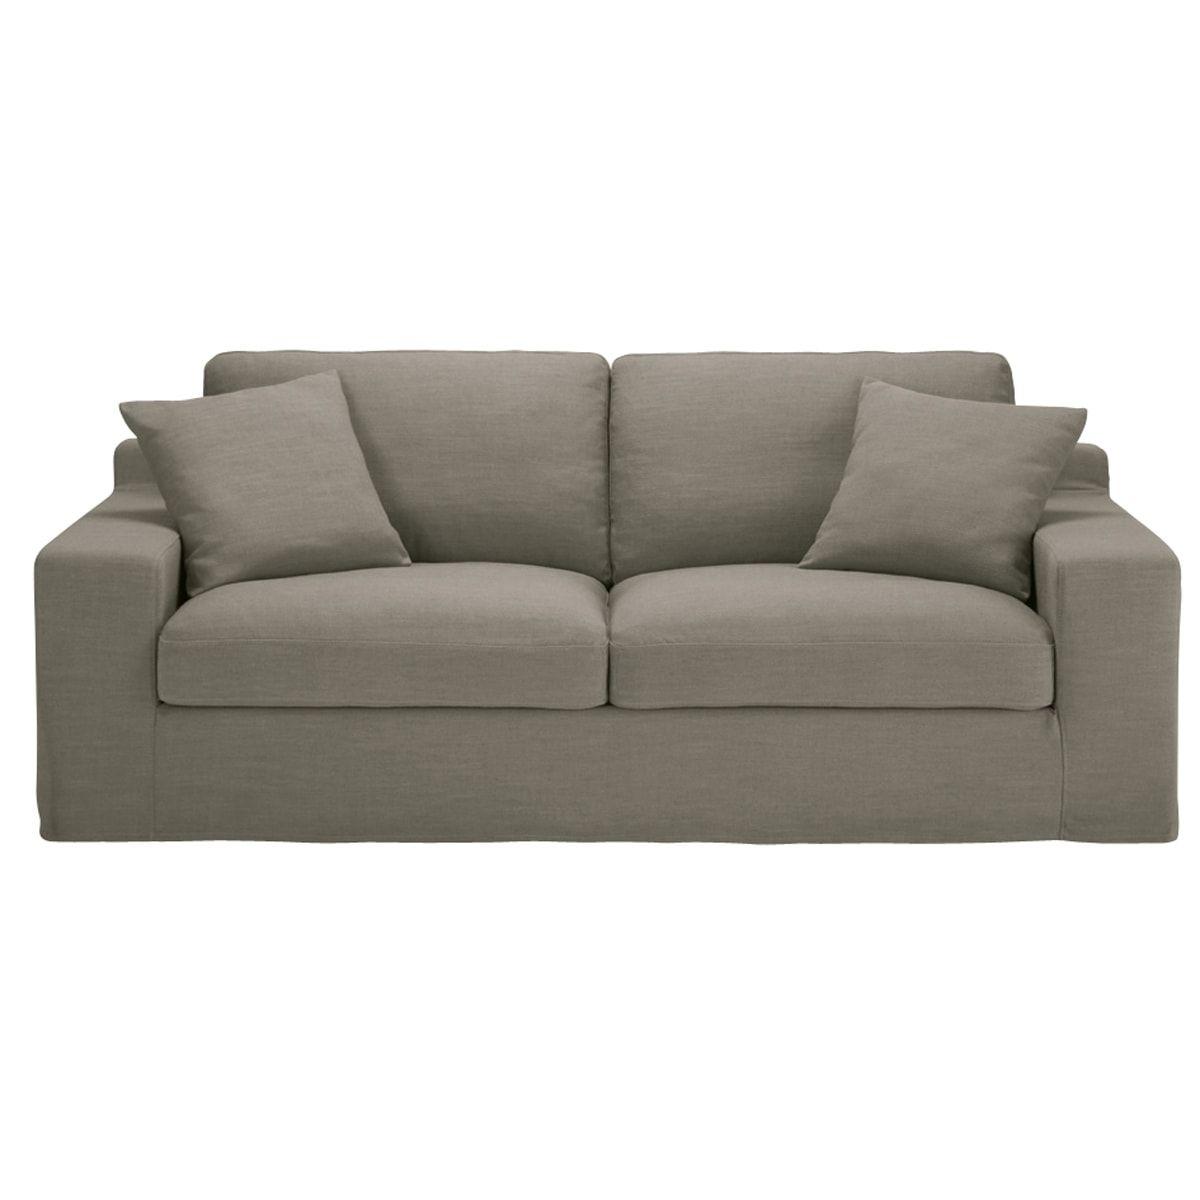 Ausziehbares 3 Sitzer Sofa Hellgrau Stuart Maisons Du Monde